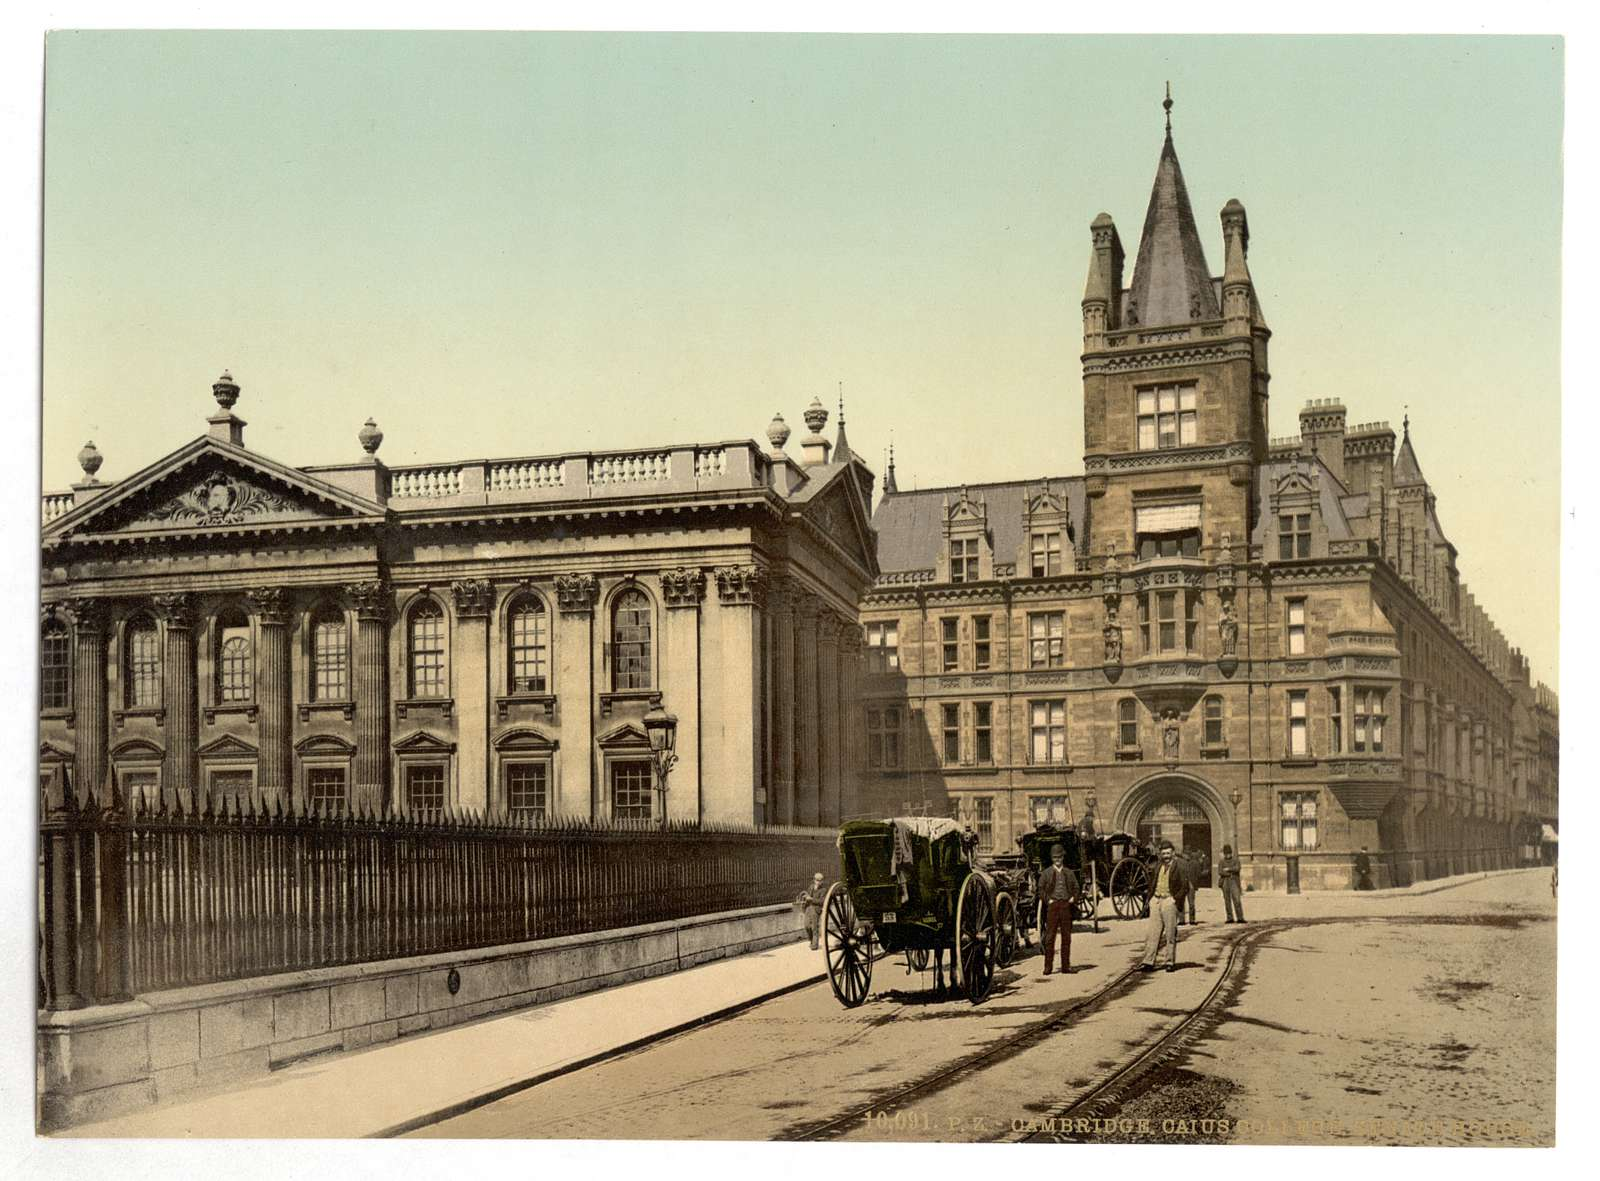 [Caius College and Senate House, Cambridge, England]